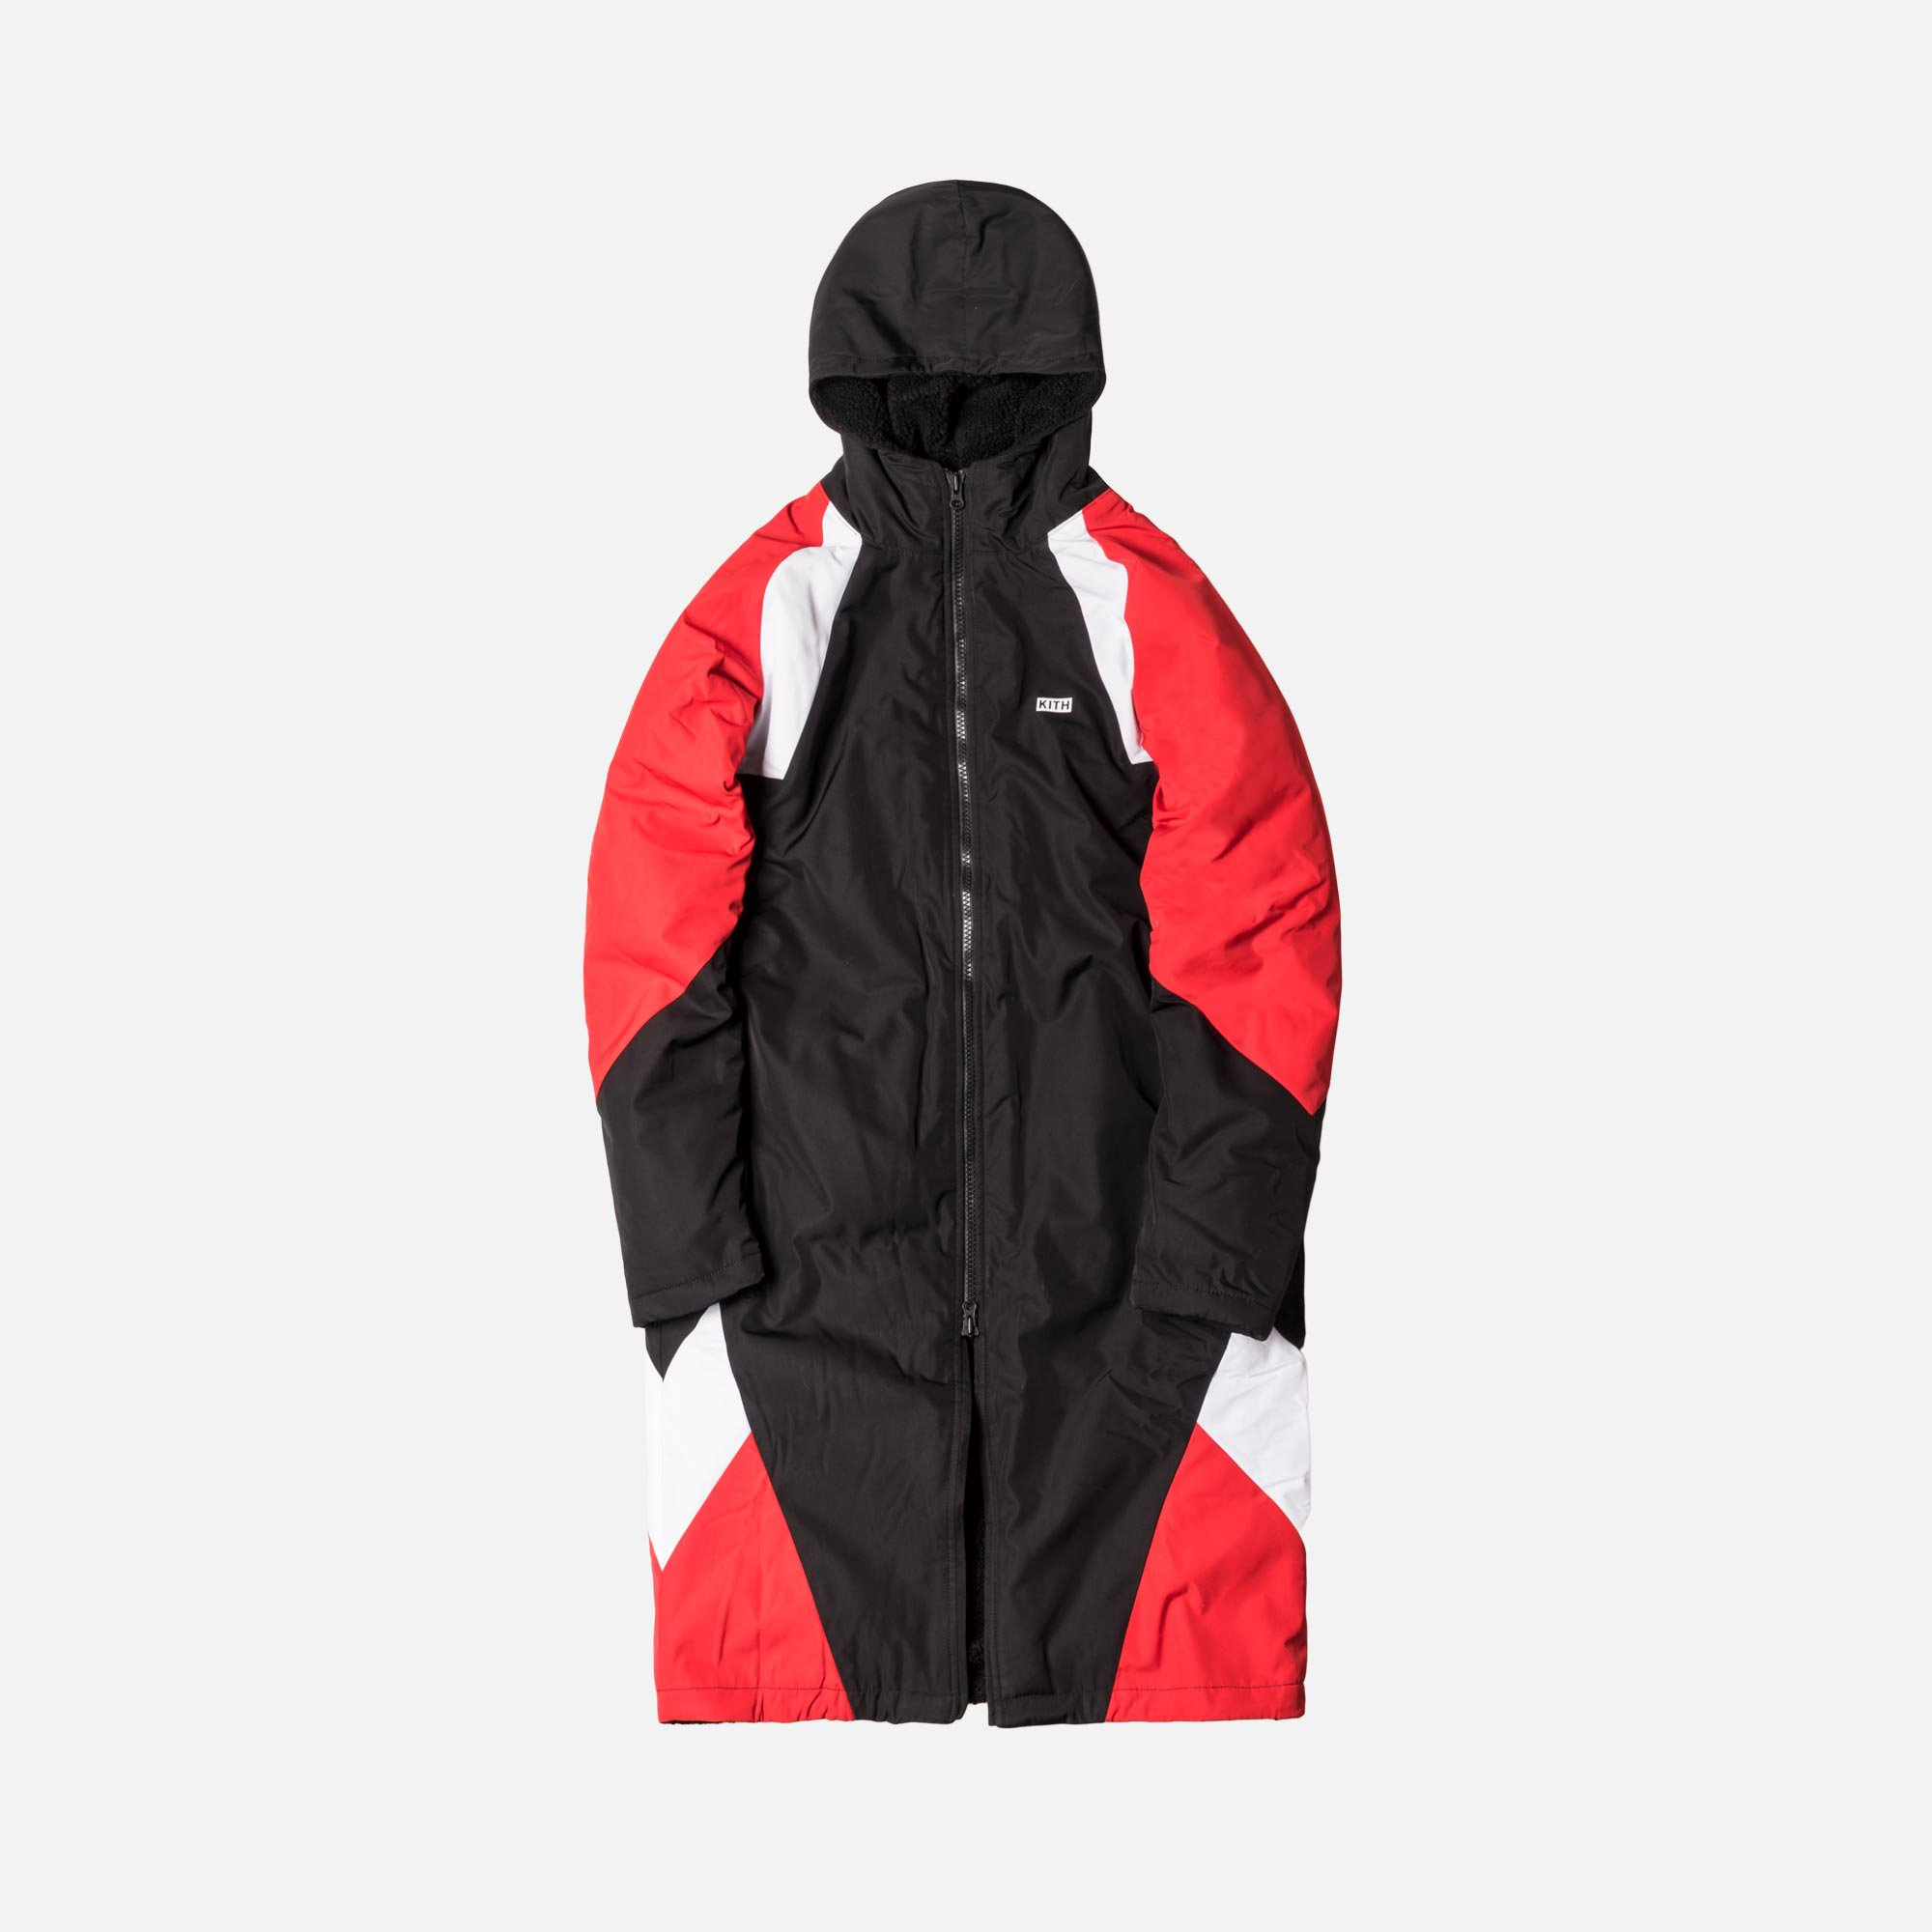 Kith x Nike Sherpa Sideline Coat